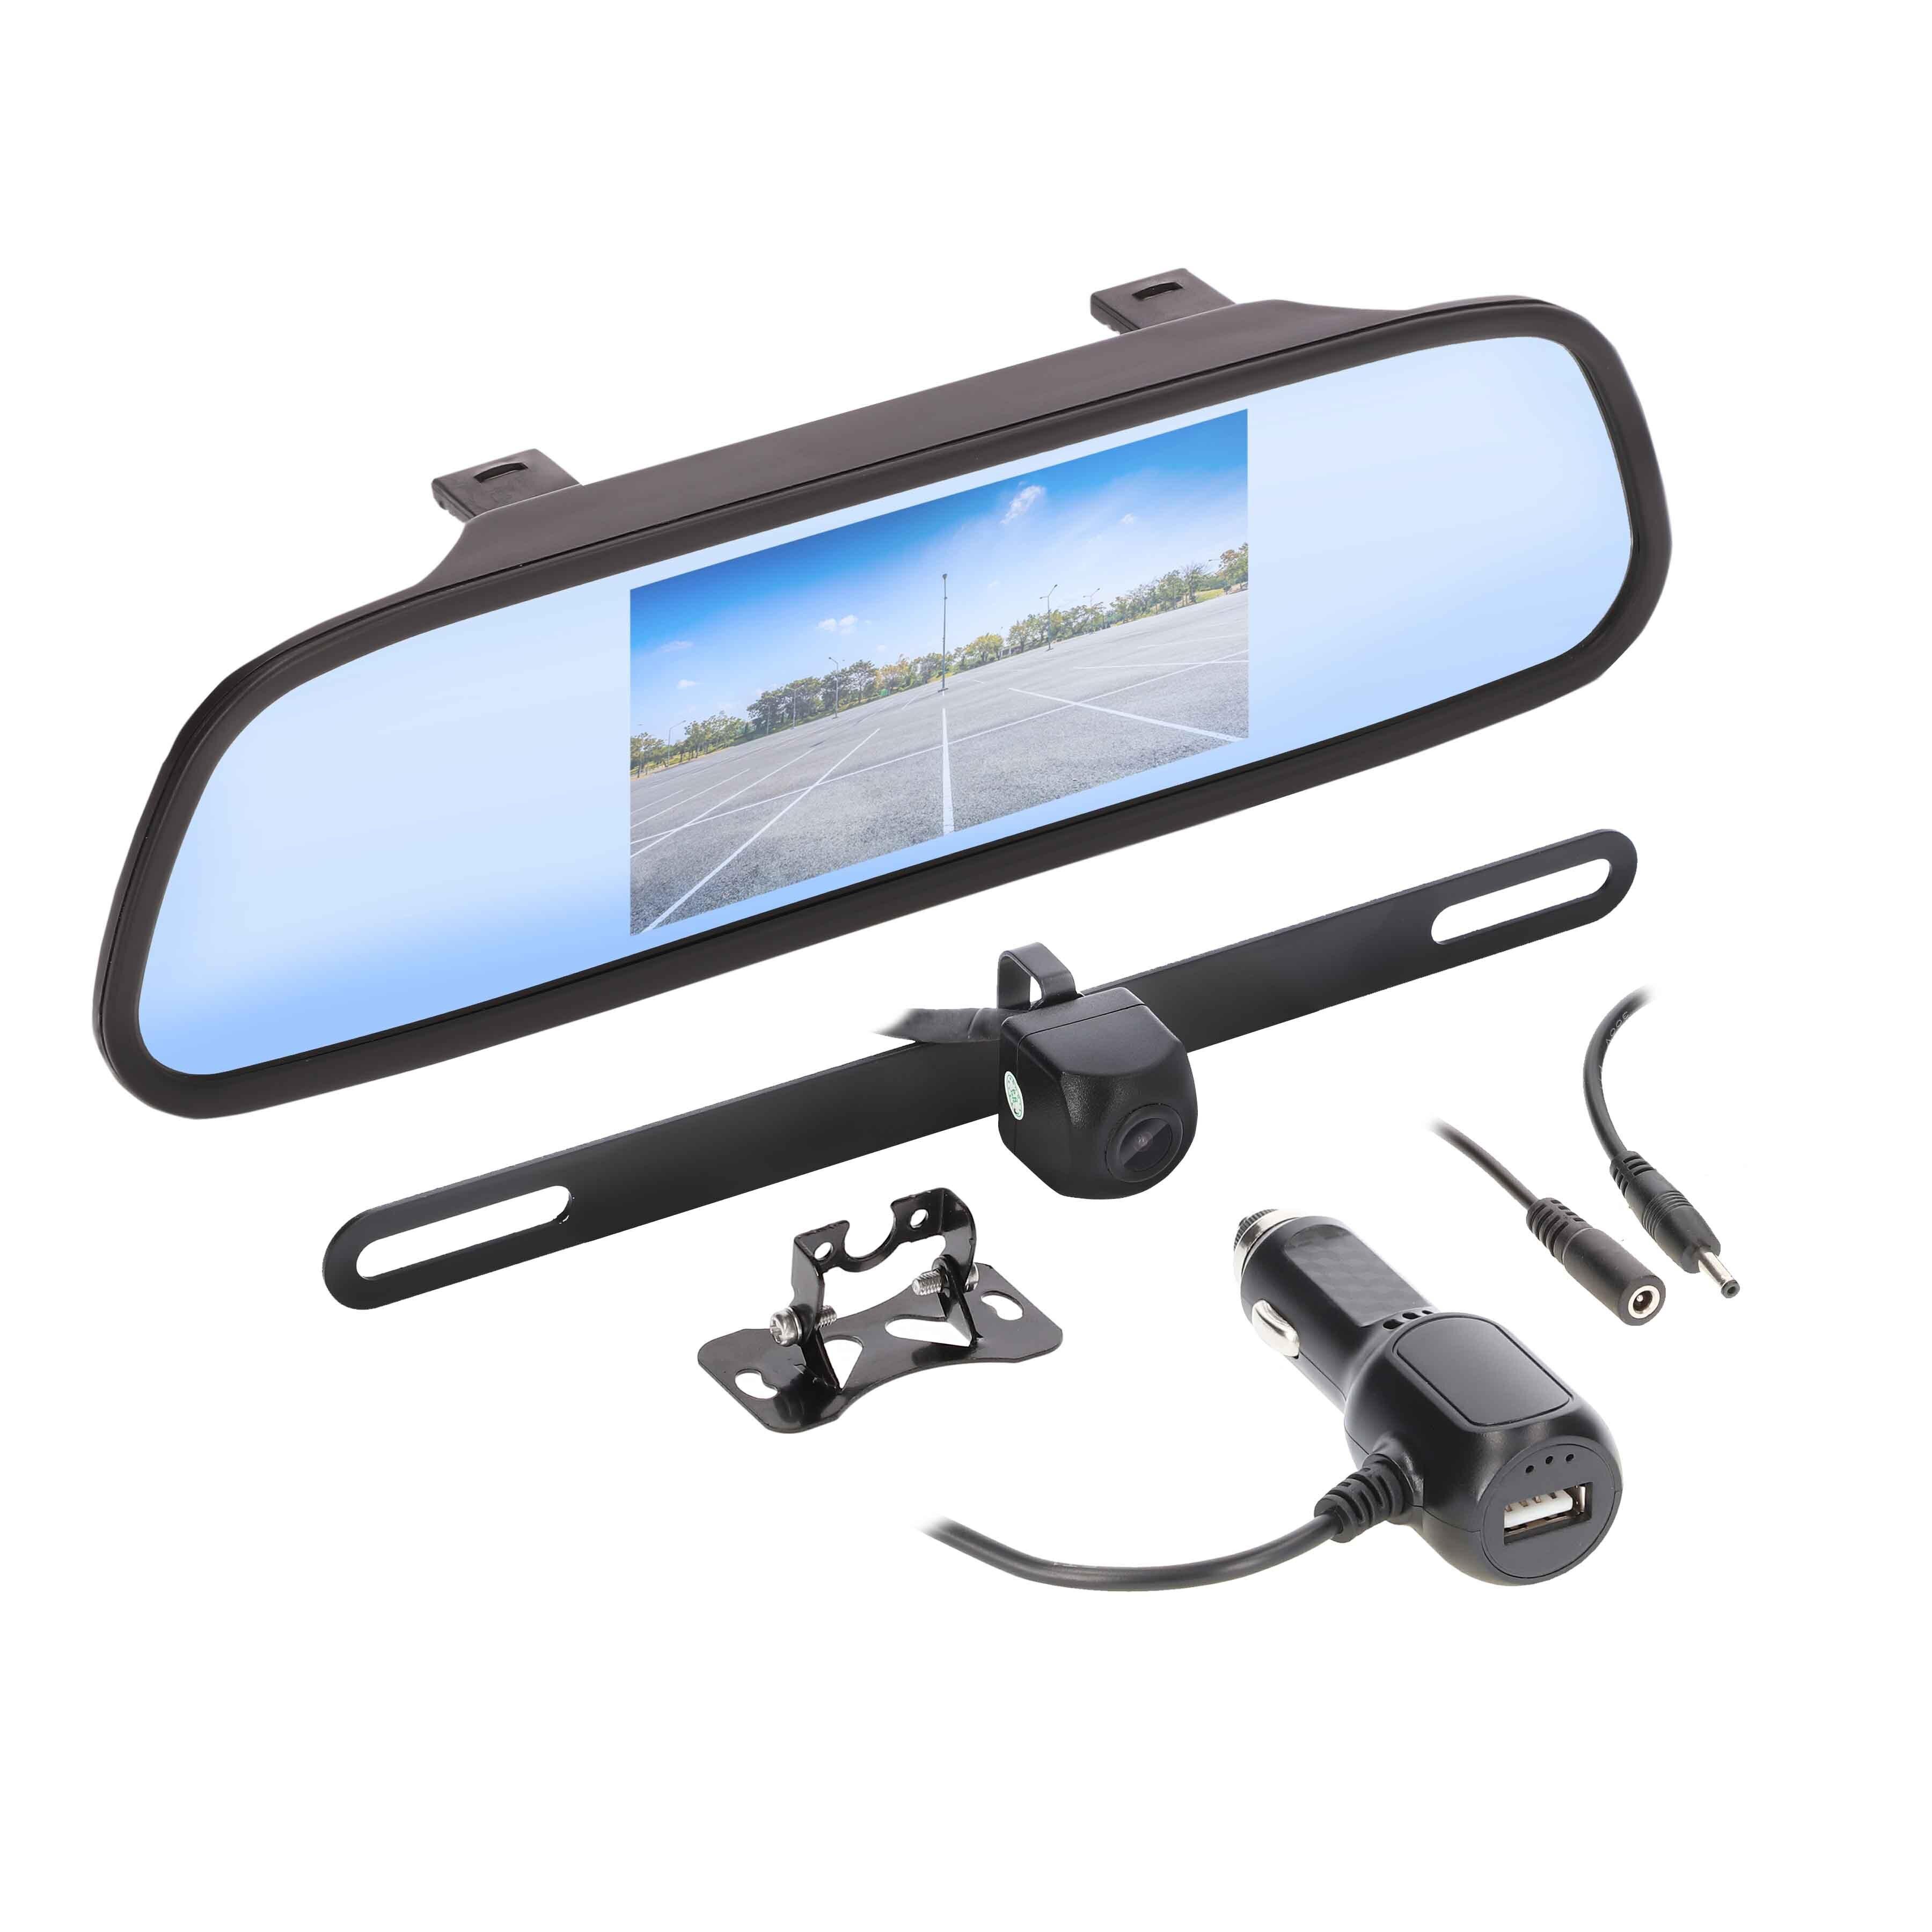 Wireless 4.3 Inch Mirror/Monitor and Camera